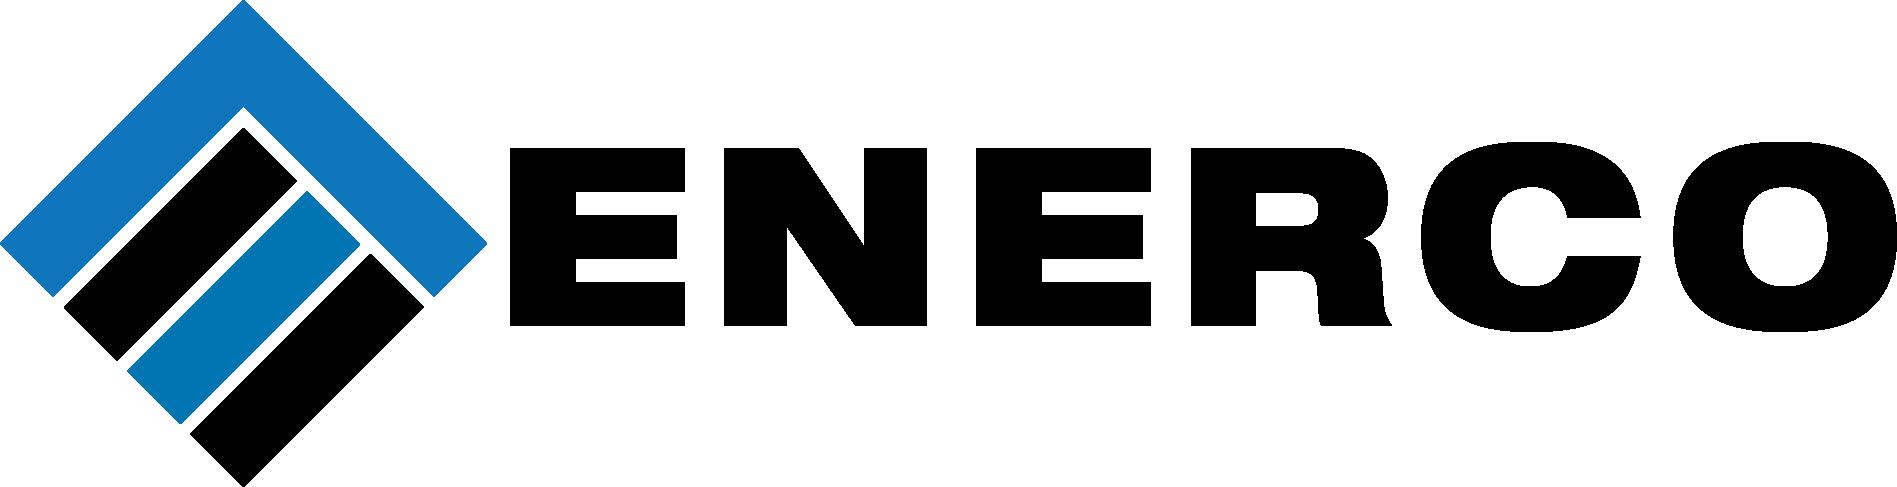 Propane Low Pressure Regulator (up to 75k BTU) Clamshell